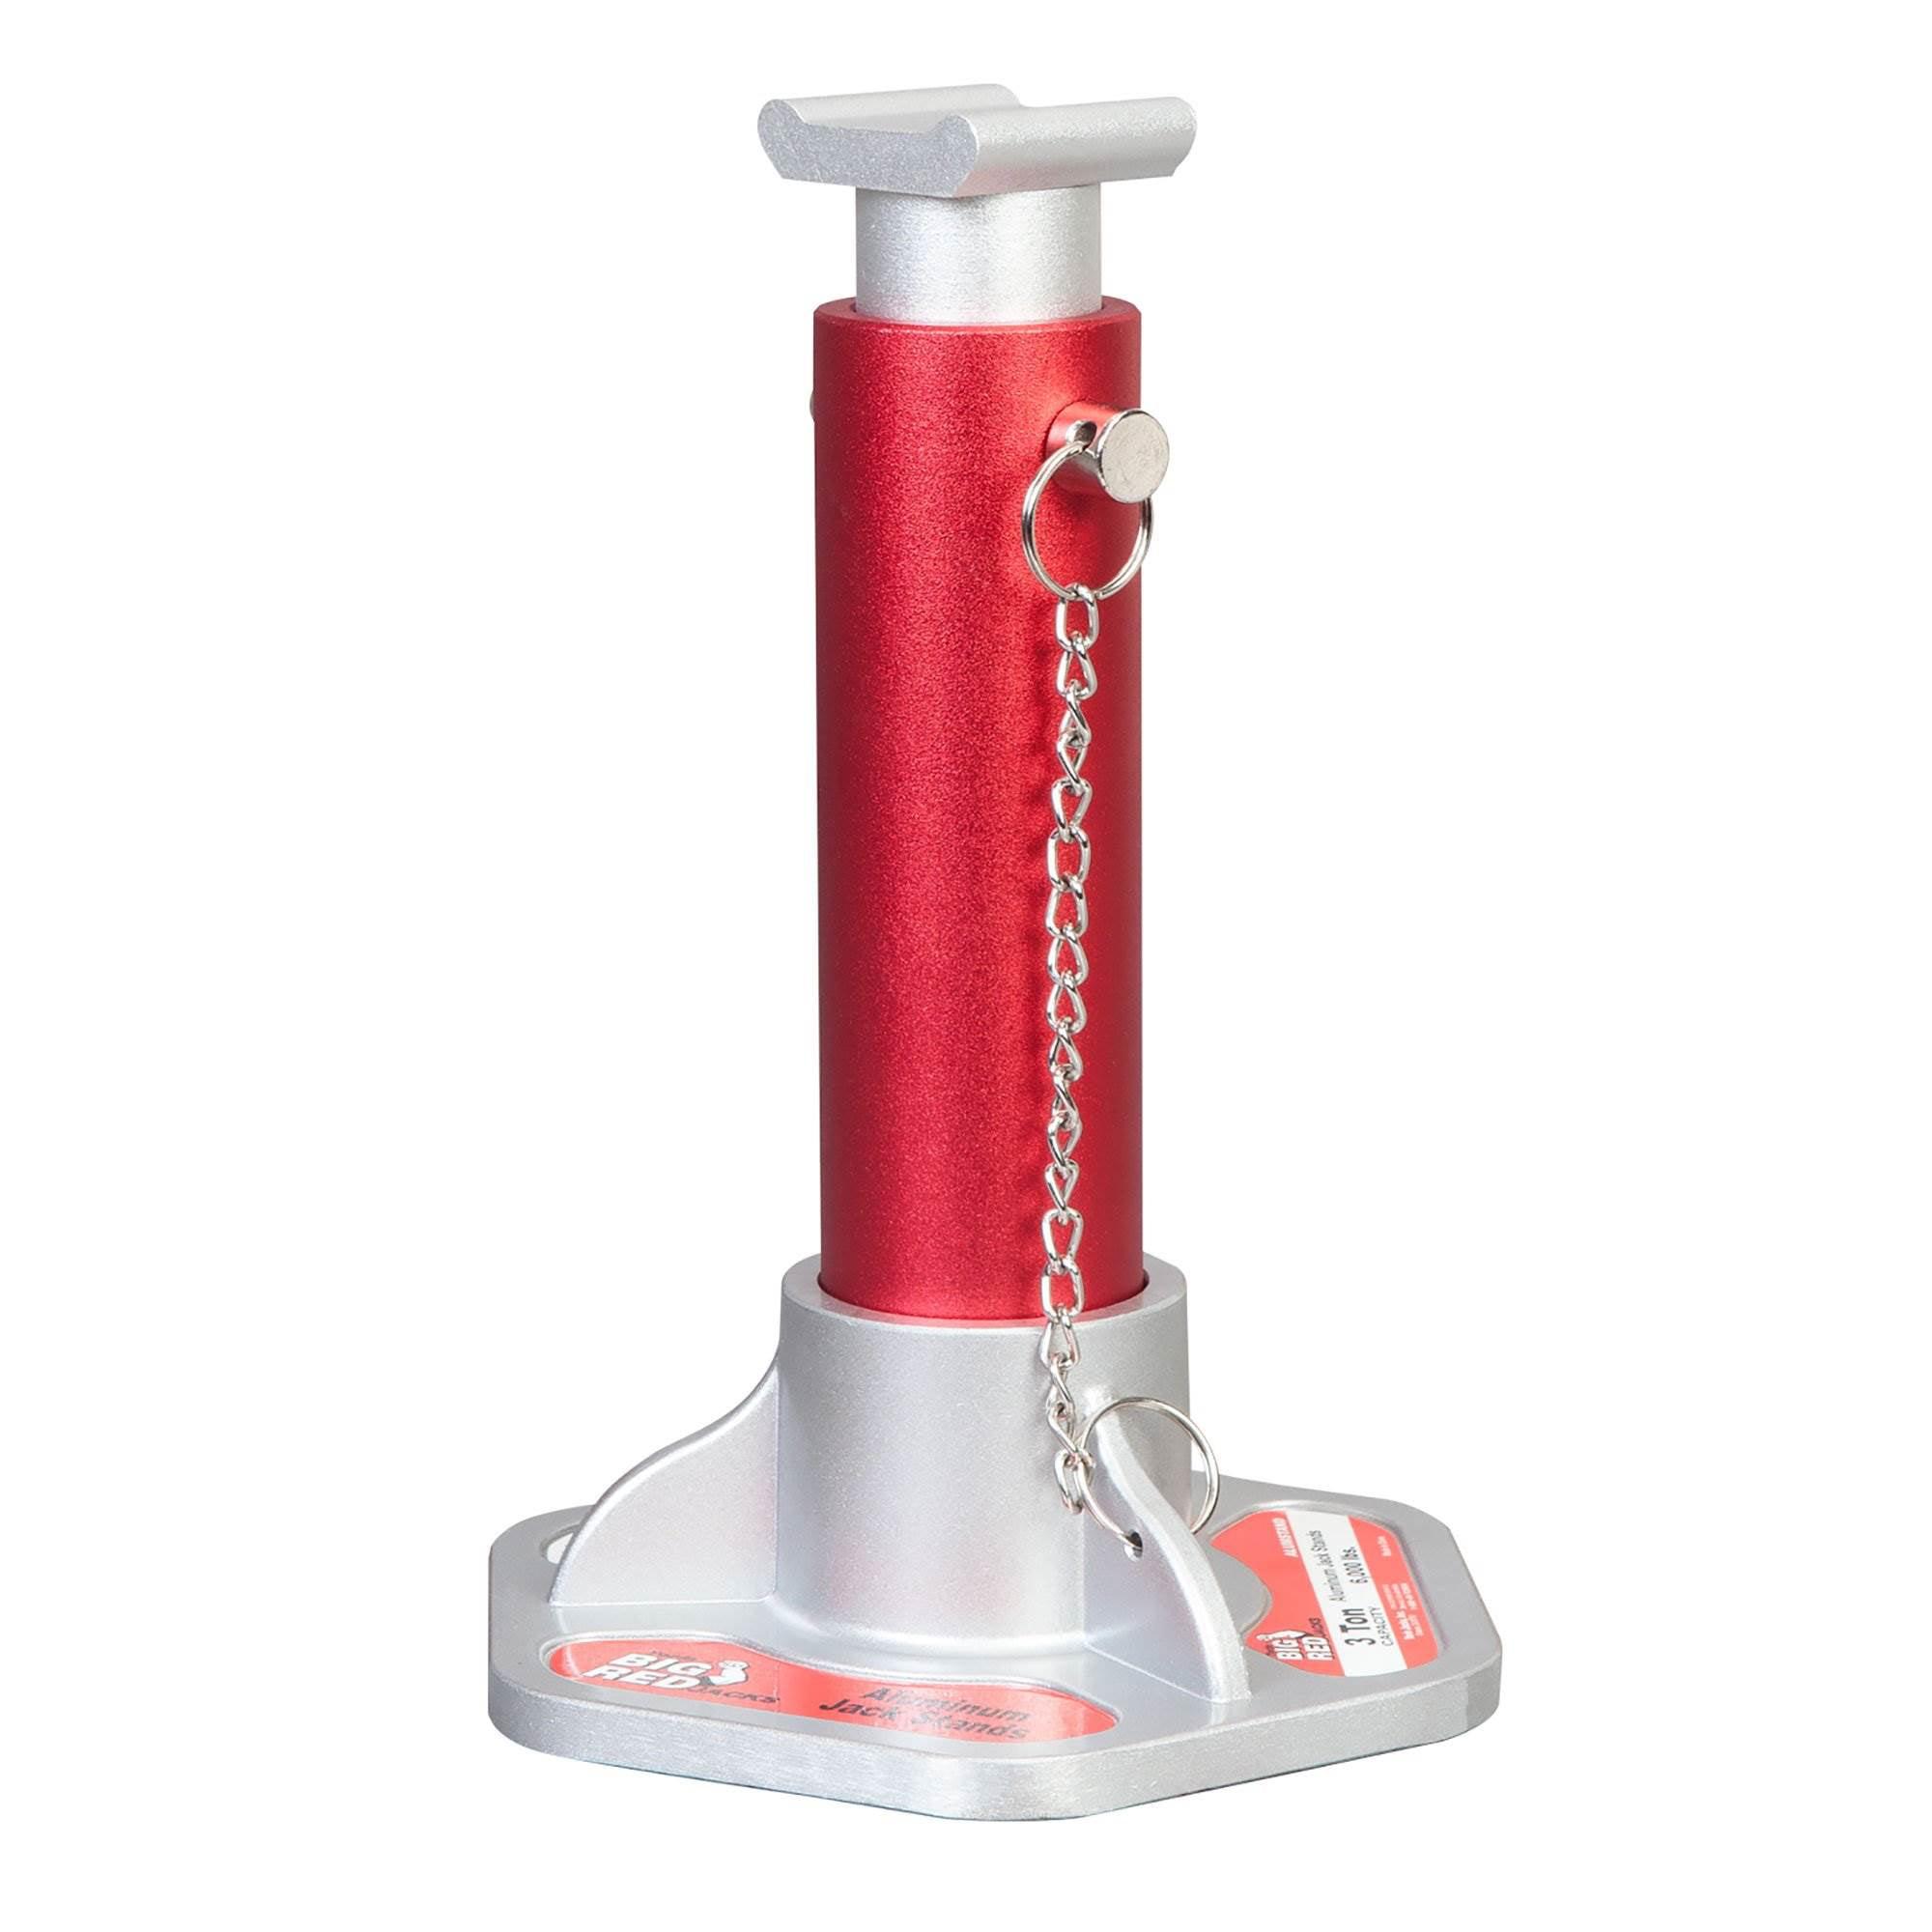 Torin Big Red Aluminum Jack Stands 1 Pair 3 Ton Capacity